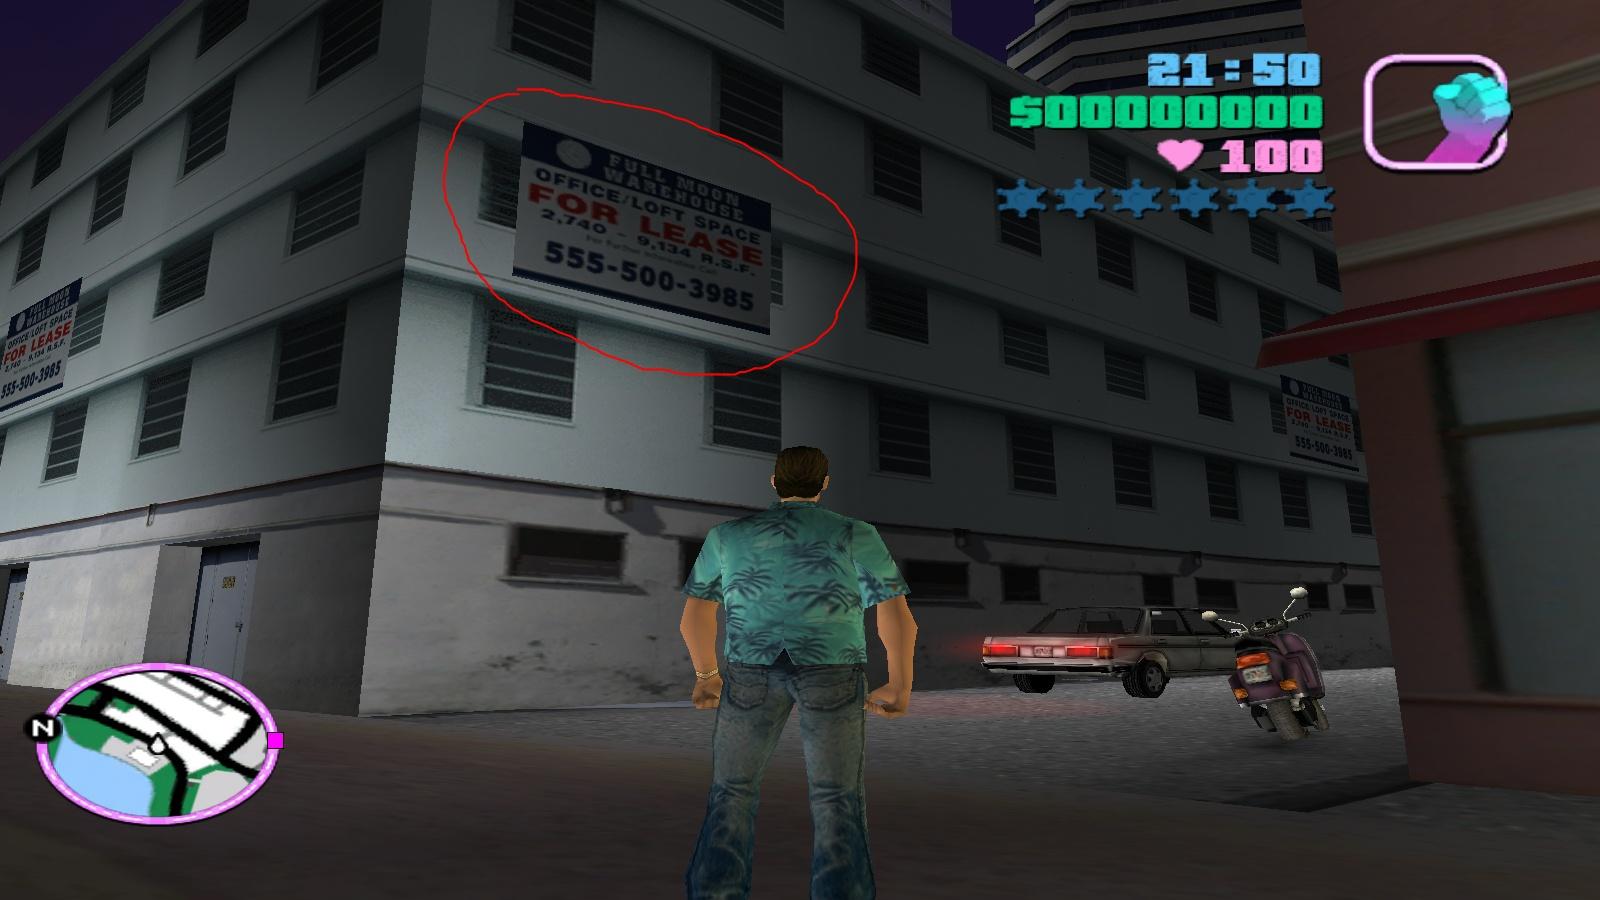 7 - Grand Theft Auto: Vice City